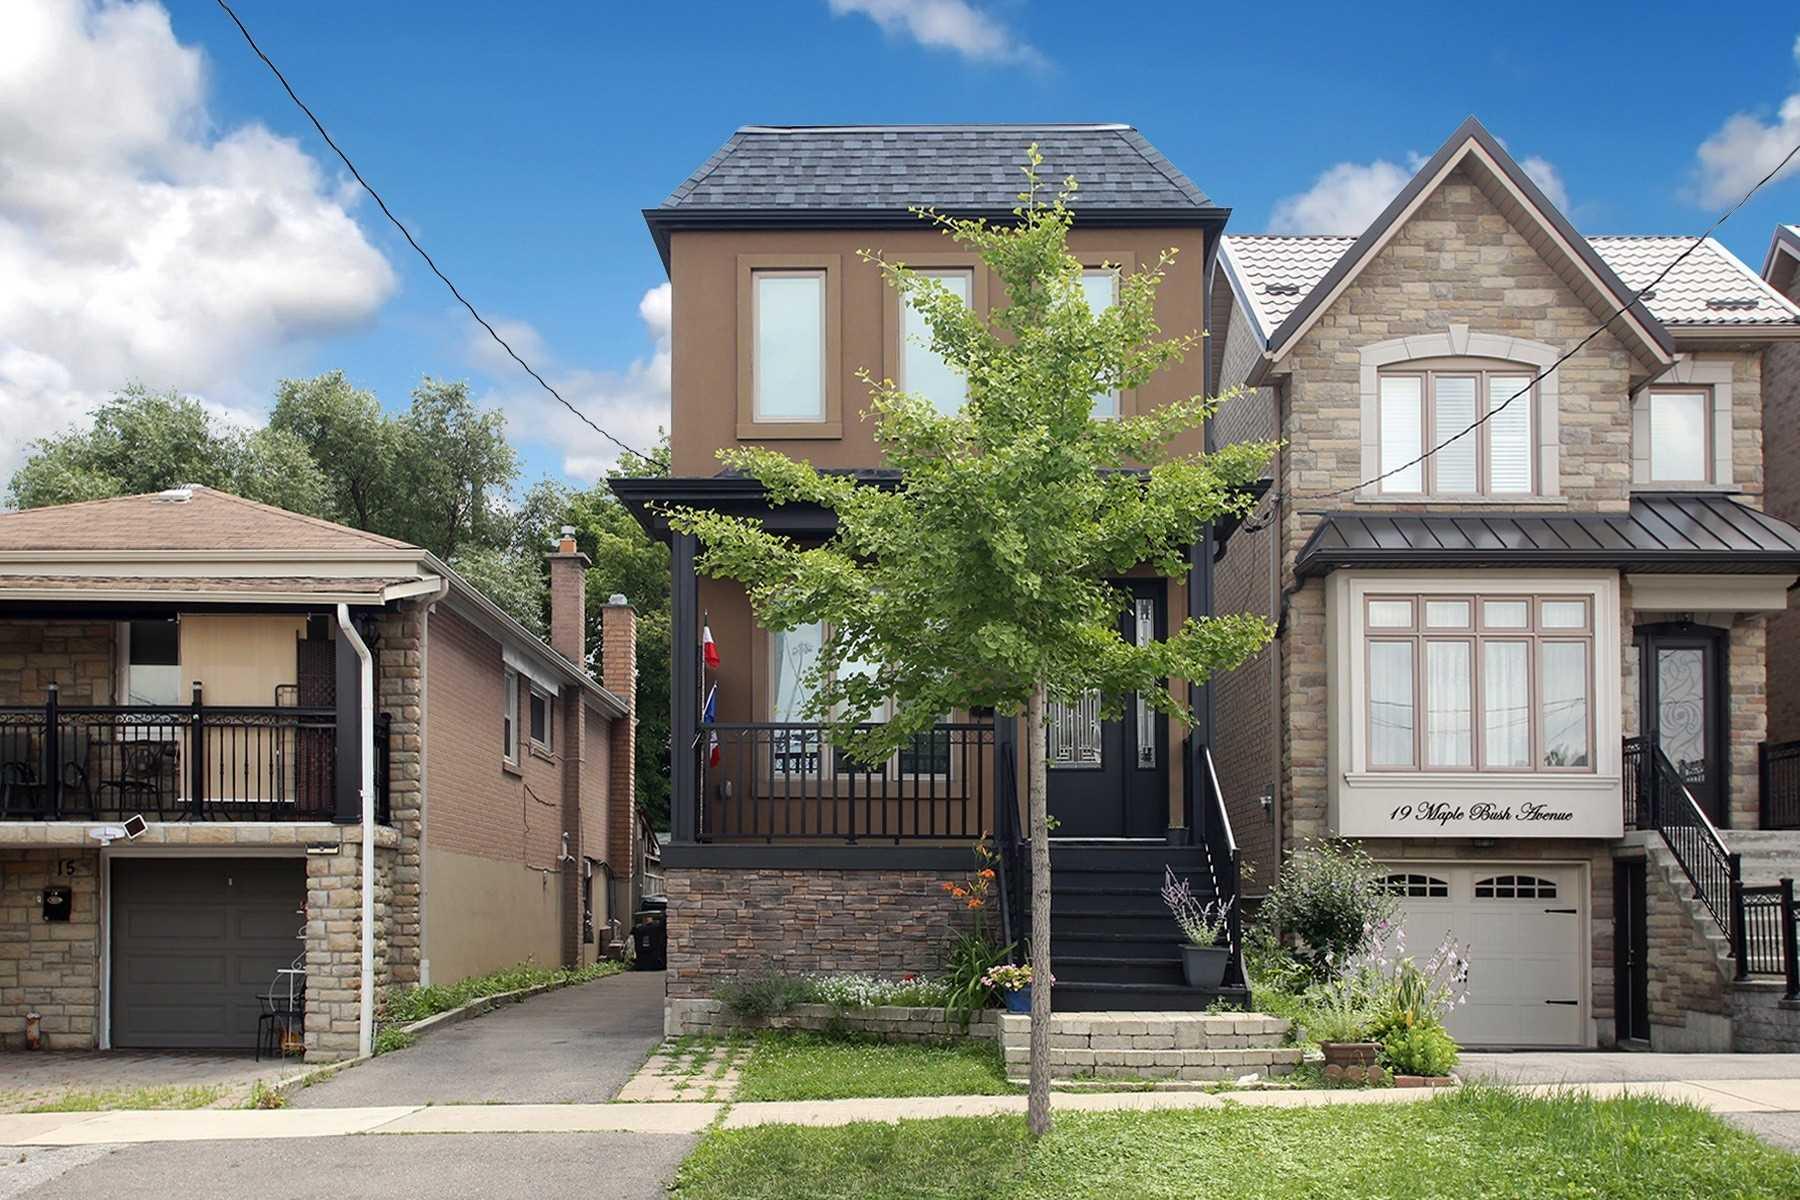 17 Maple Bush Ave, Toronto, Ontario M9N1S7, 4 Bedrooms Bedrooms, 8 Rooms Rooms,4 BathroomsBathrooms,Detached,For Sale,Maple Bush,W5306789